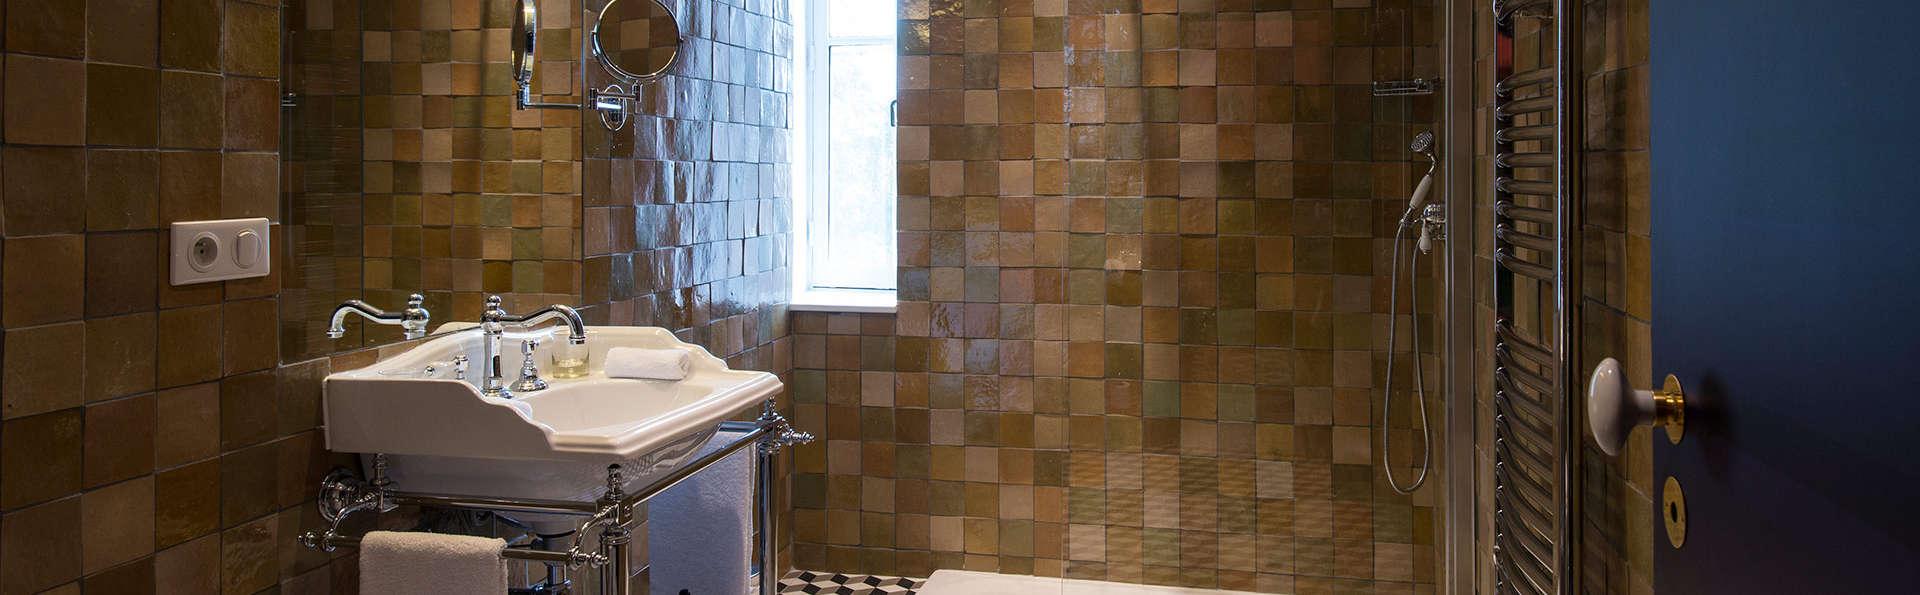 Hôtel & Spa Jules César Arles - MGallery - EDIT_bath.jpg